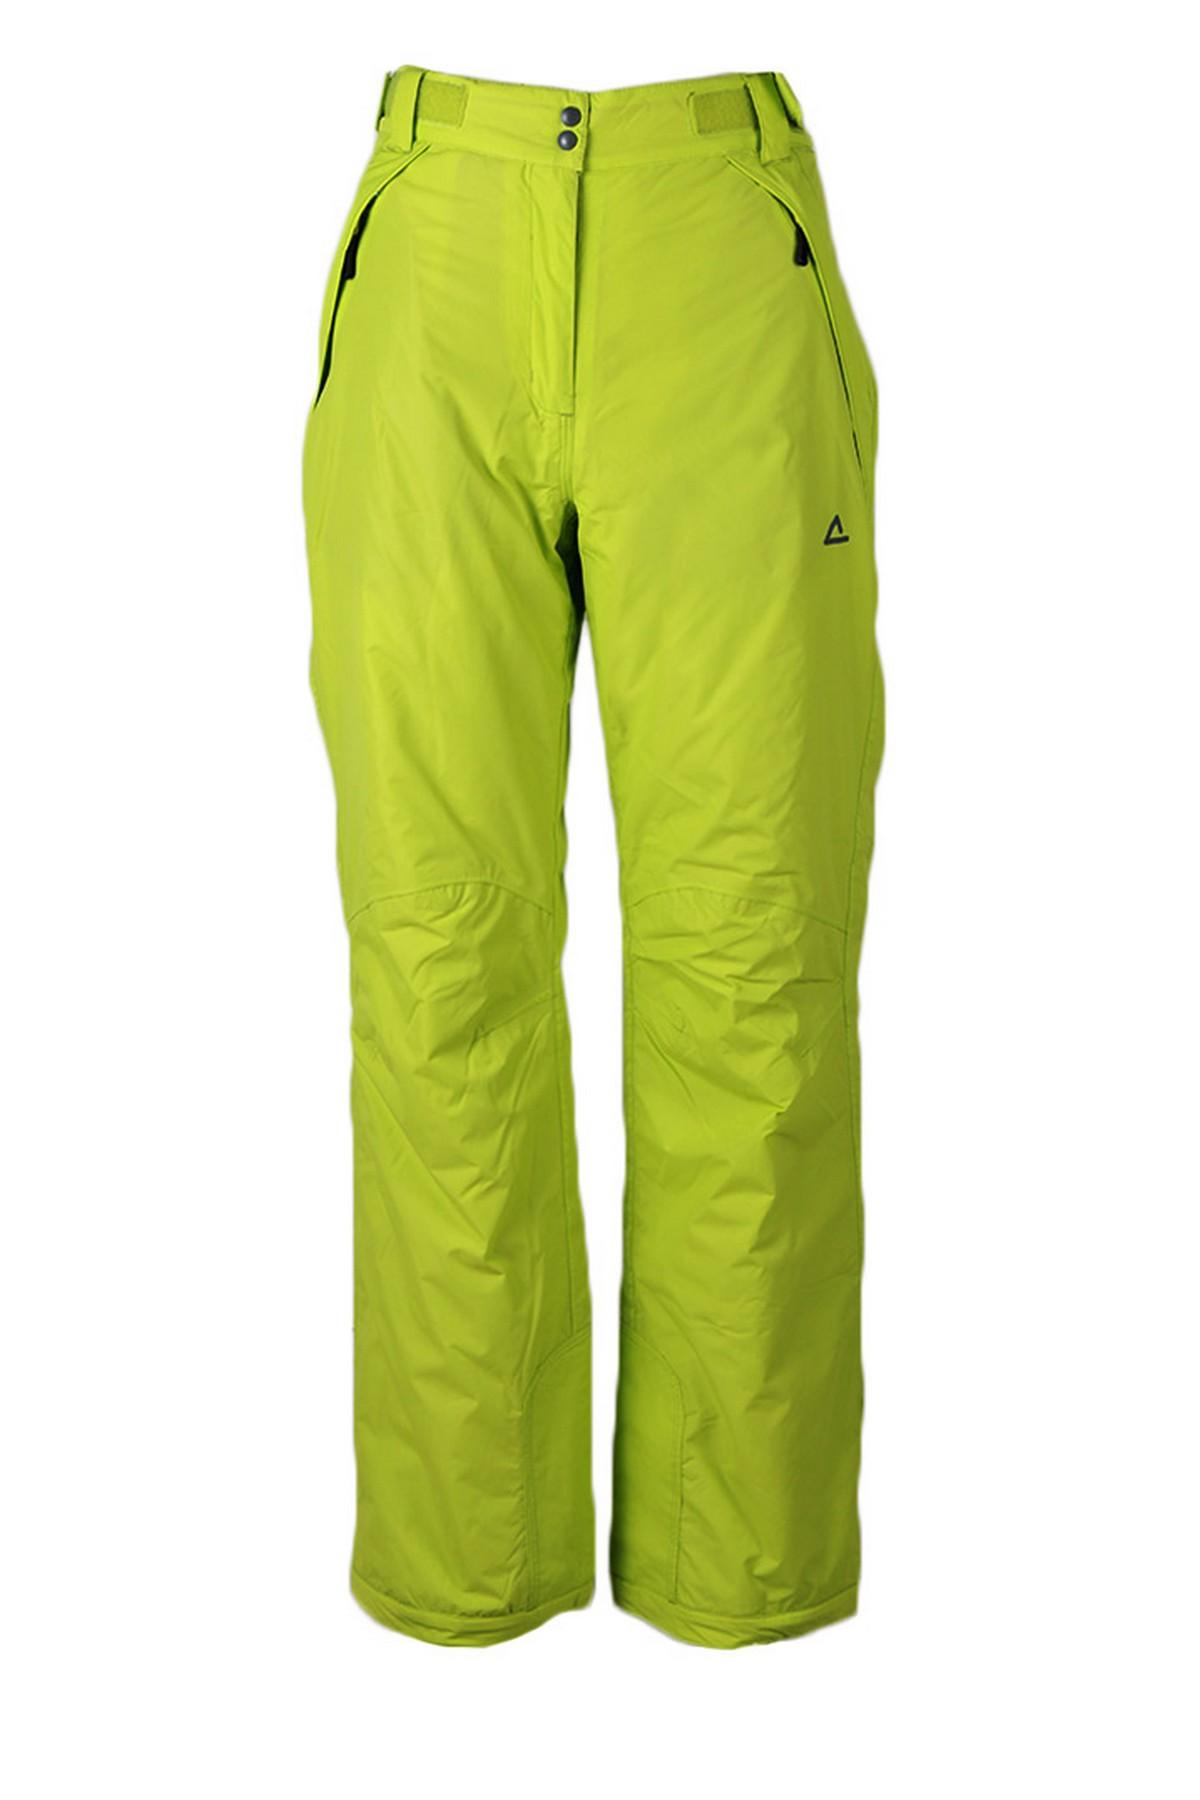 Dare2b Headturn Lime Punch Kadın Yeşil Kayak Pantolonu (DWW050-3N8)